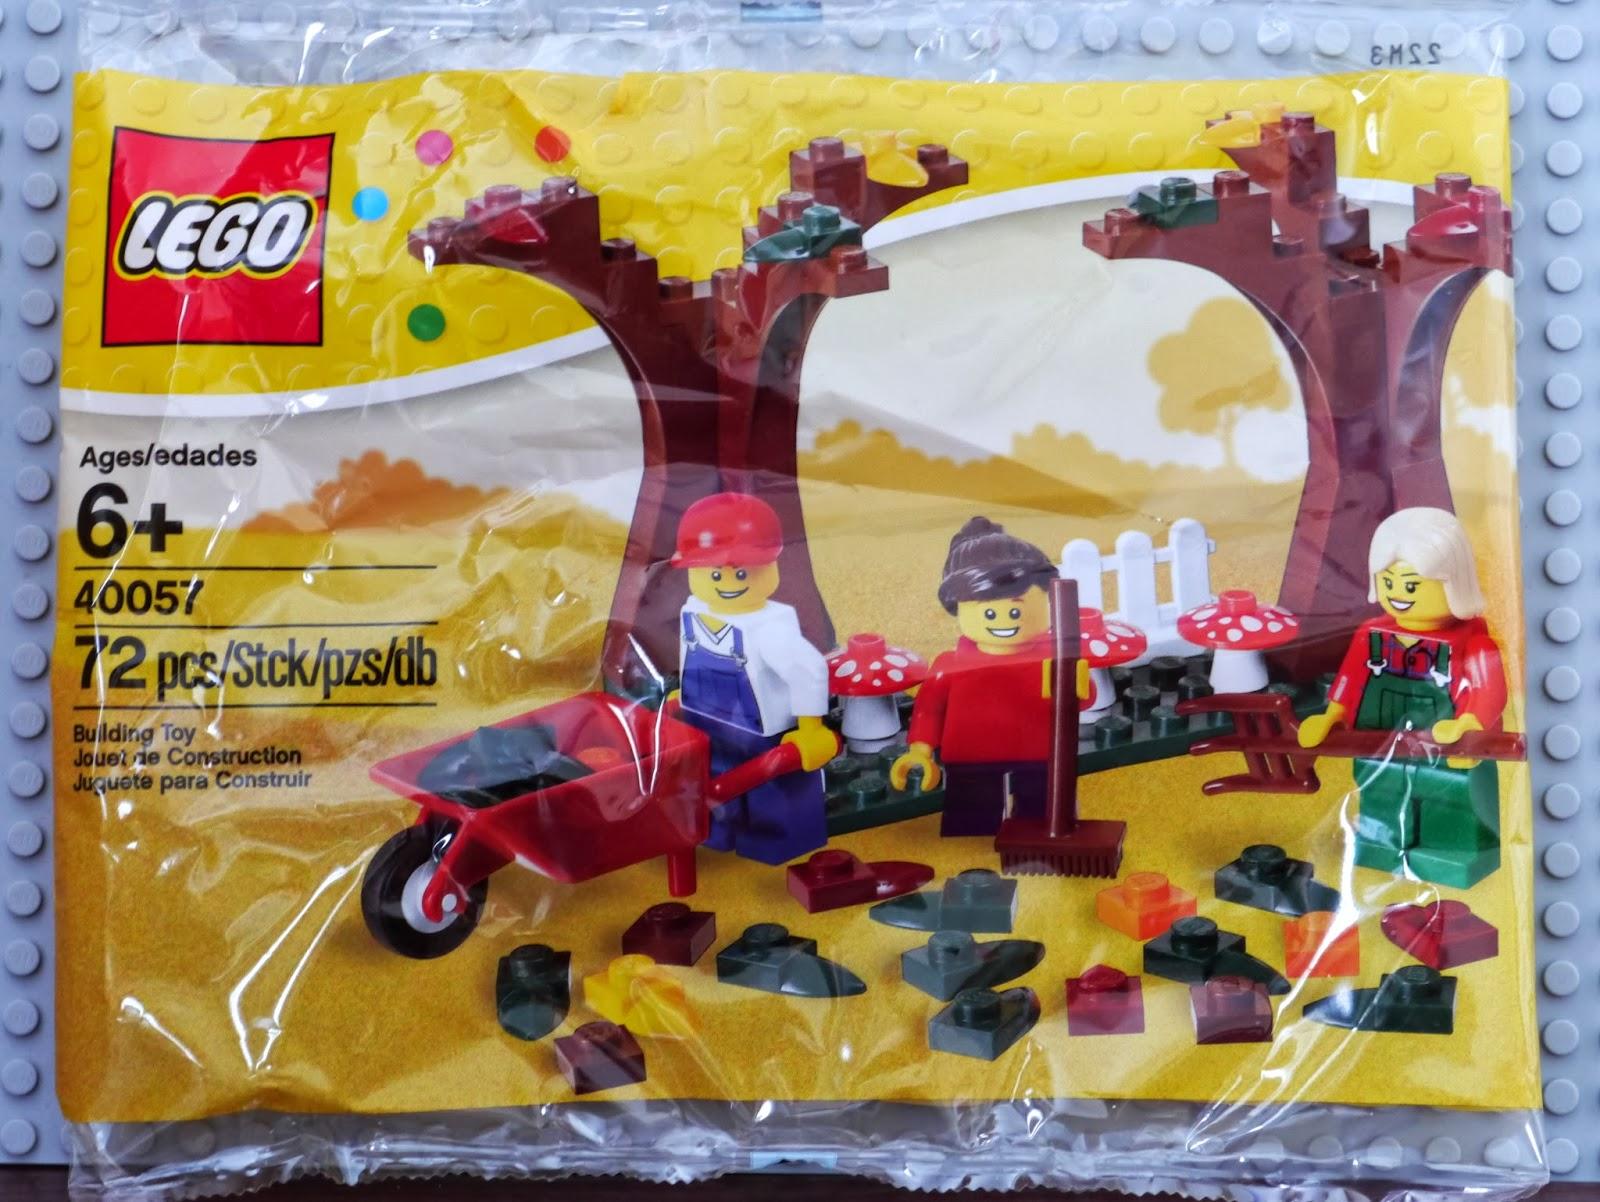 Minifigure Construction Tool NEW Lego City Red Minifig Garden WHEEL BARROW